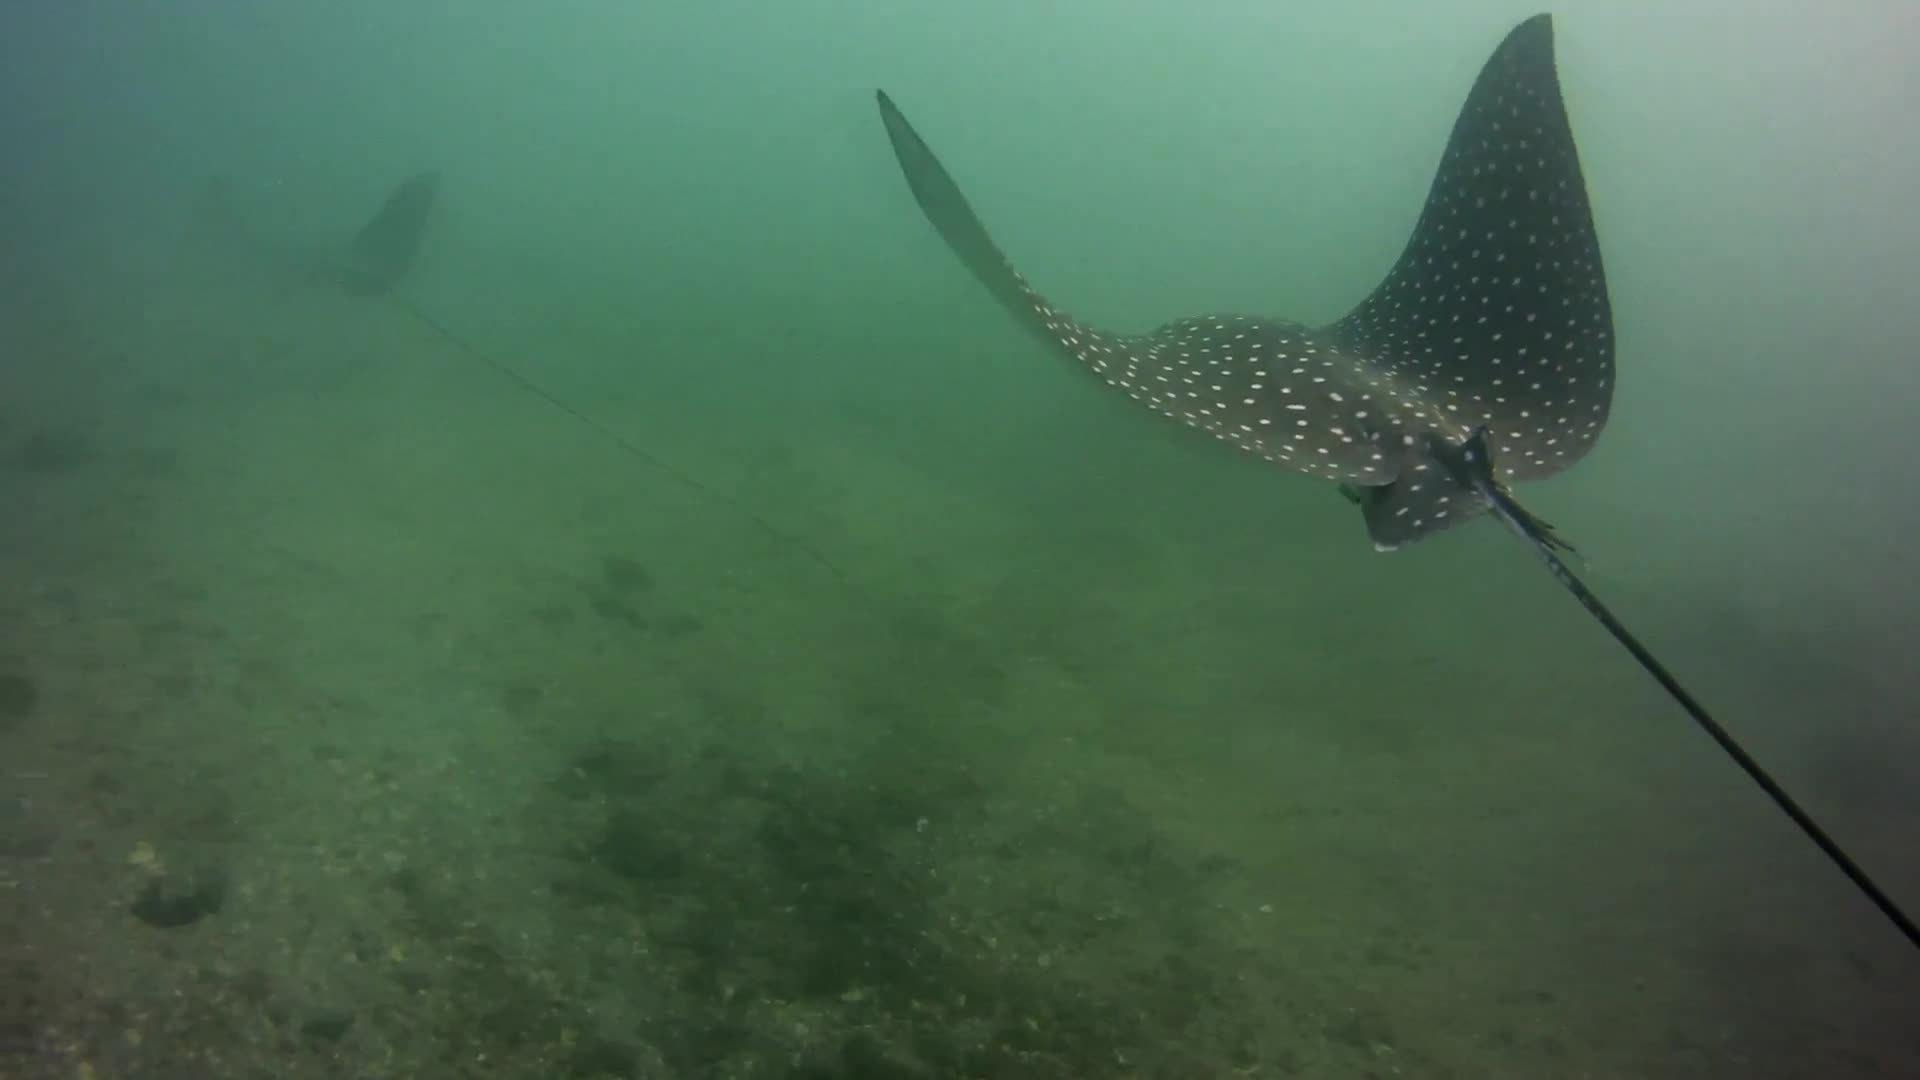 flying fish, scuba, scuba dive, Living the Dream 2.0 (Ryan Walton 2016) GIFs